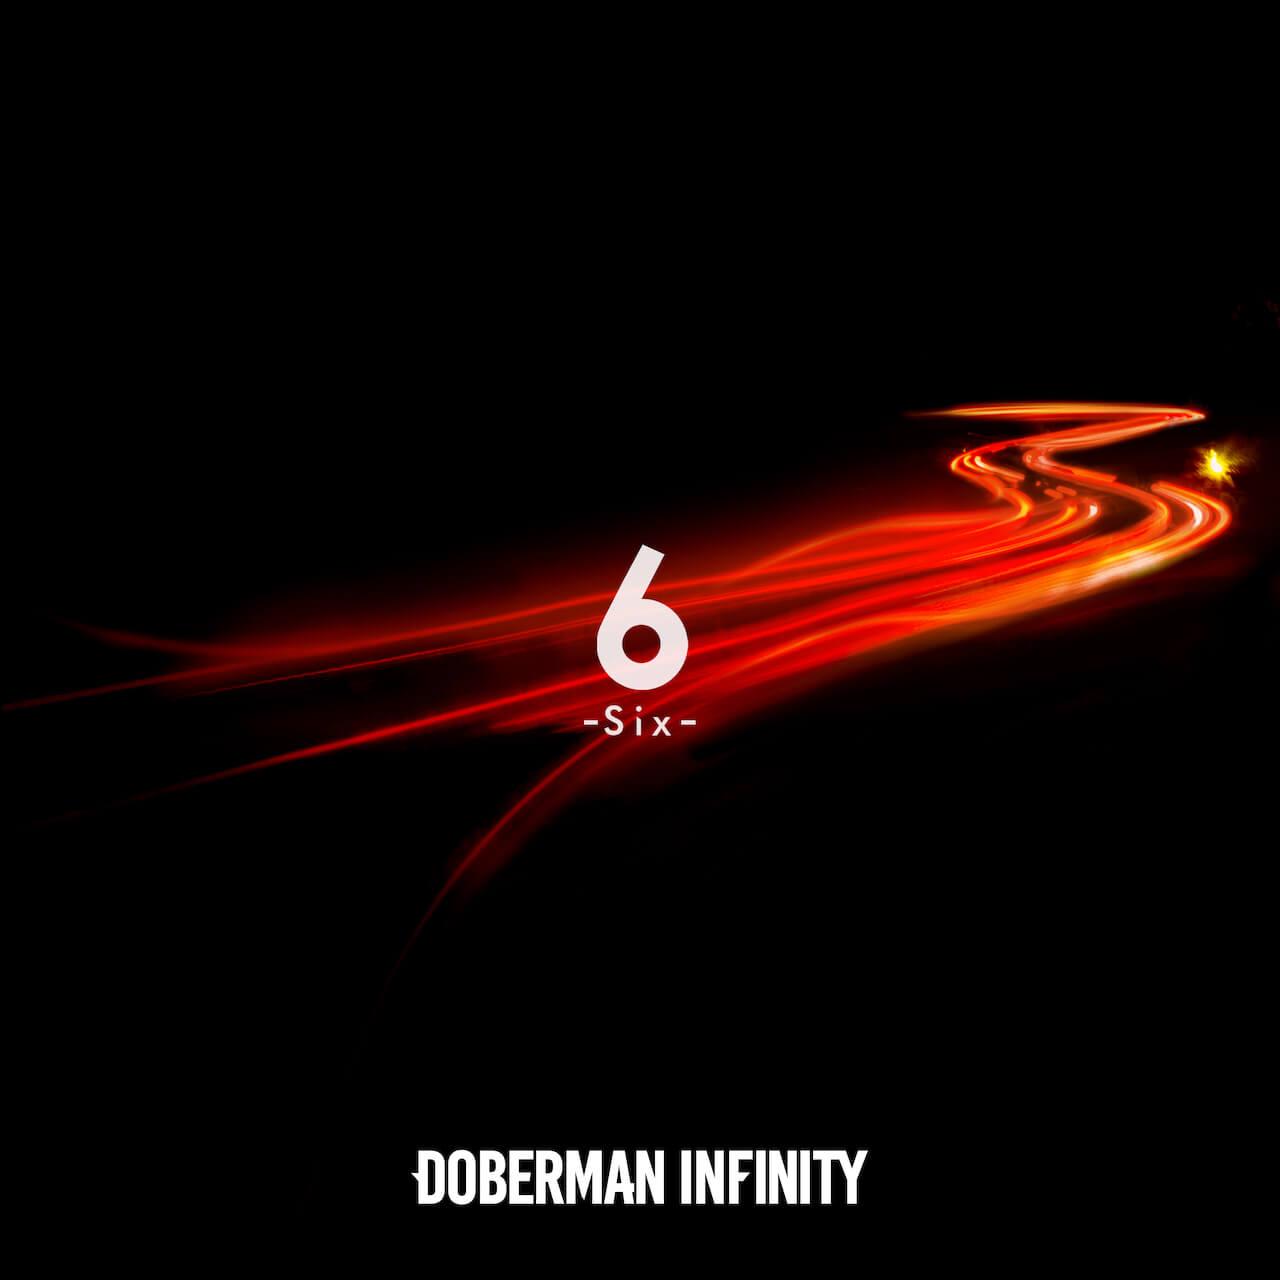 DOBERMAN INFINITY「6-Six」